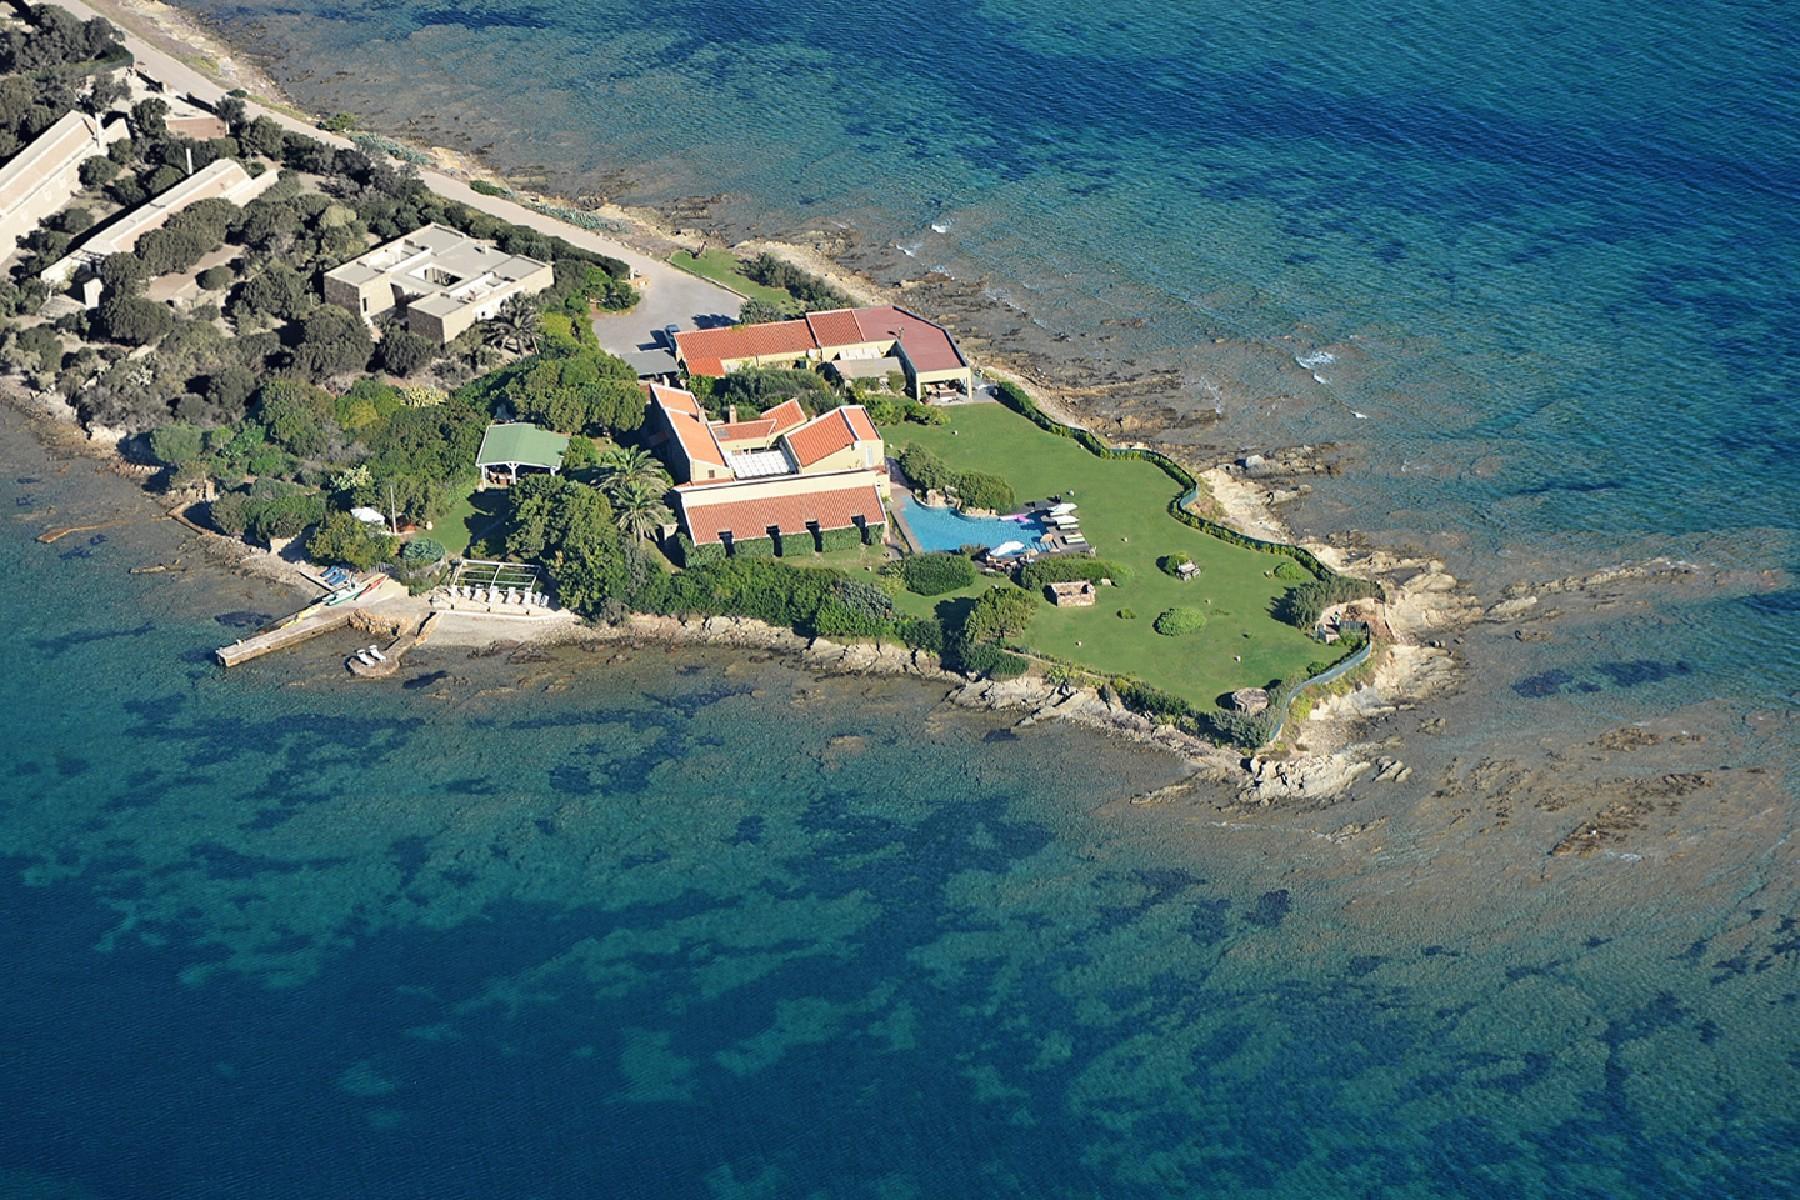 Pieds-dans-l'eau Villa auf einer privaten Halbinsel - 3